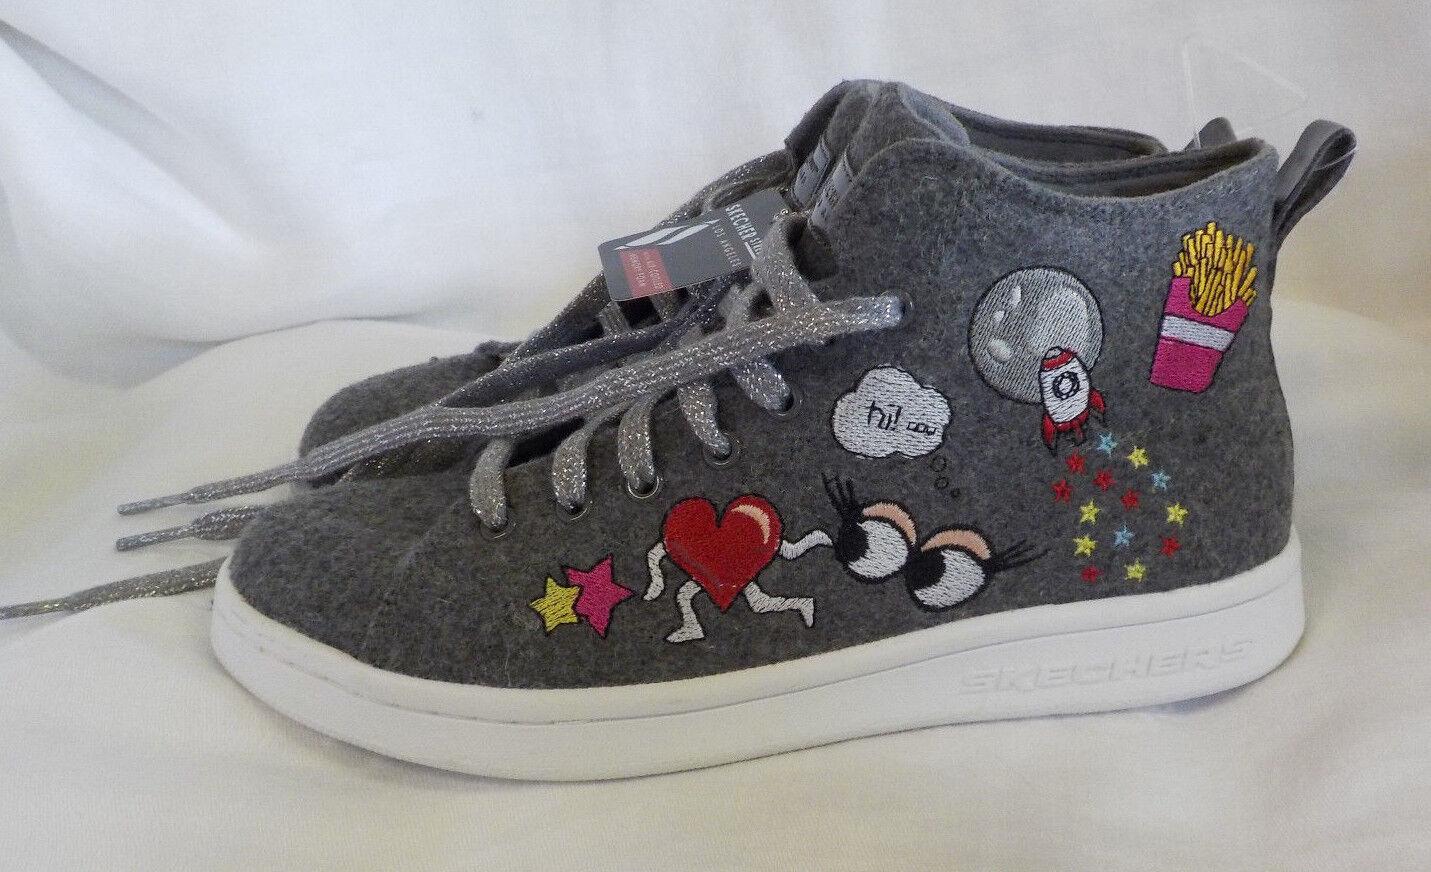 Skechers Street High Top Size 7 M NWT Grey Embroidered Textile Hidden Heel Spark